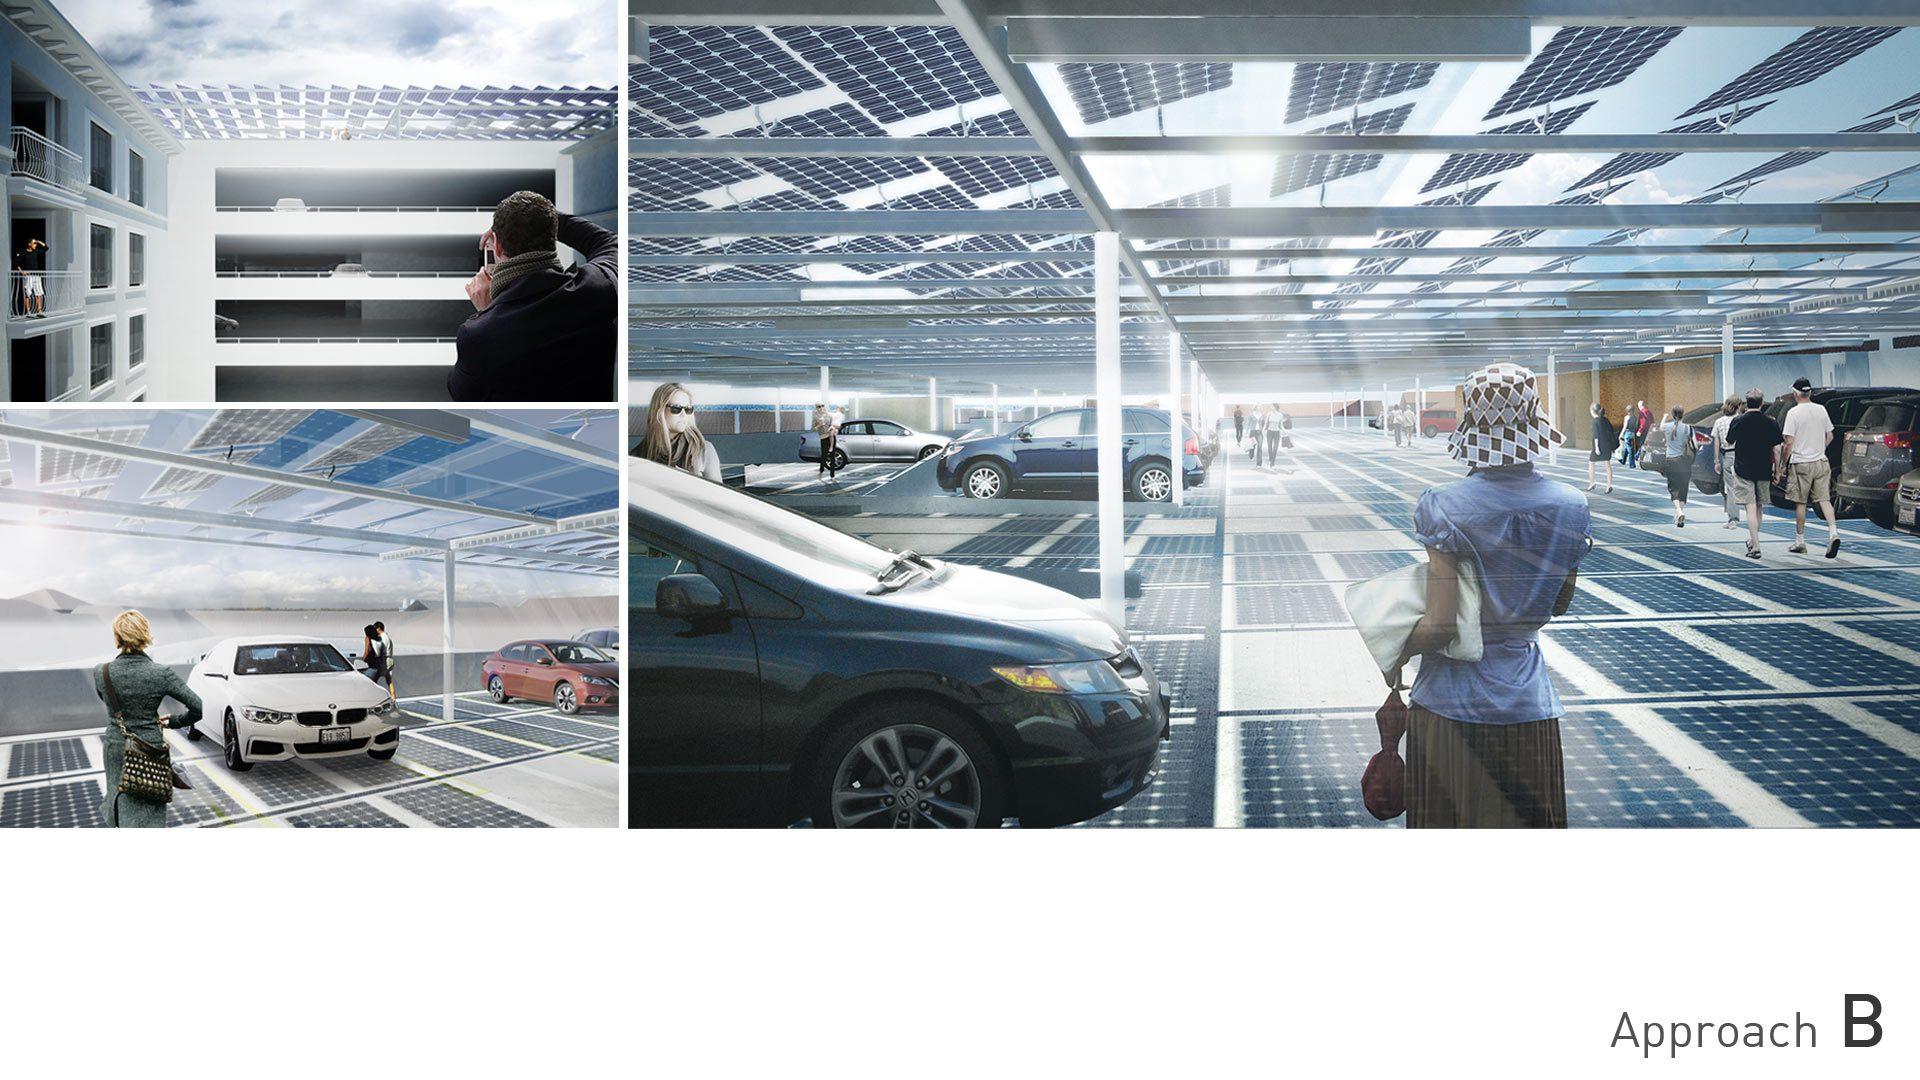 03_-MTC-Photovoltaic-Approach-B